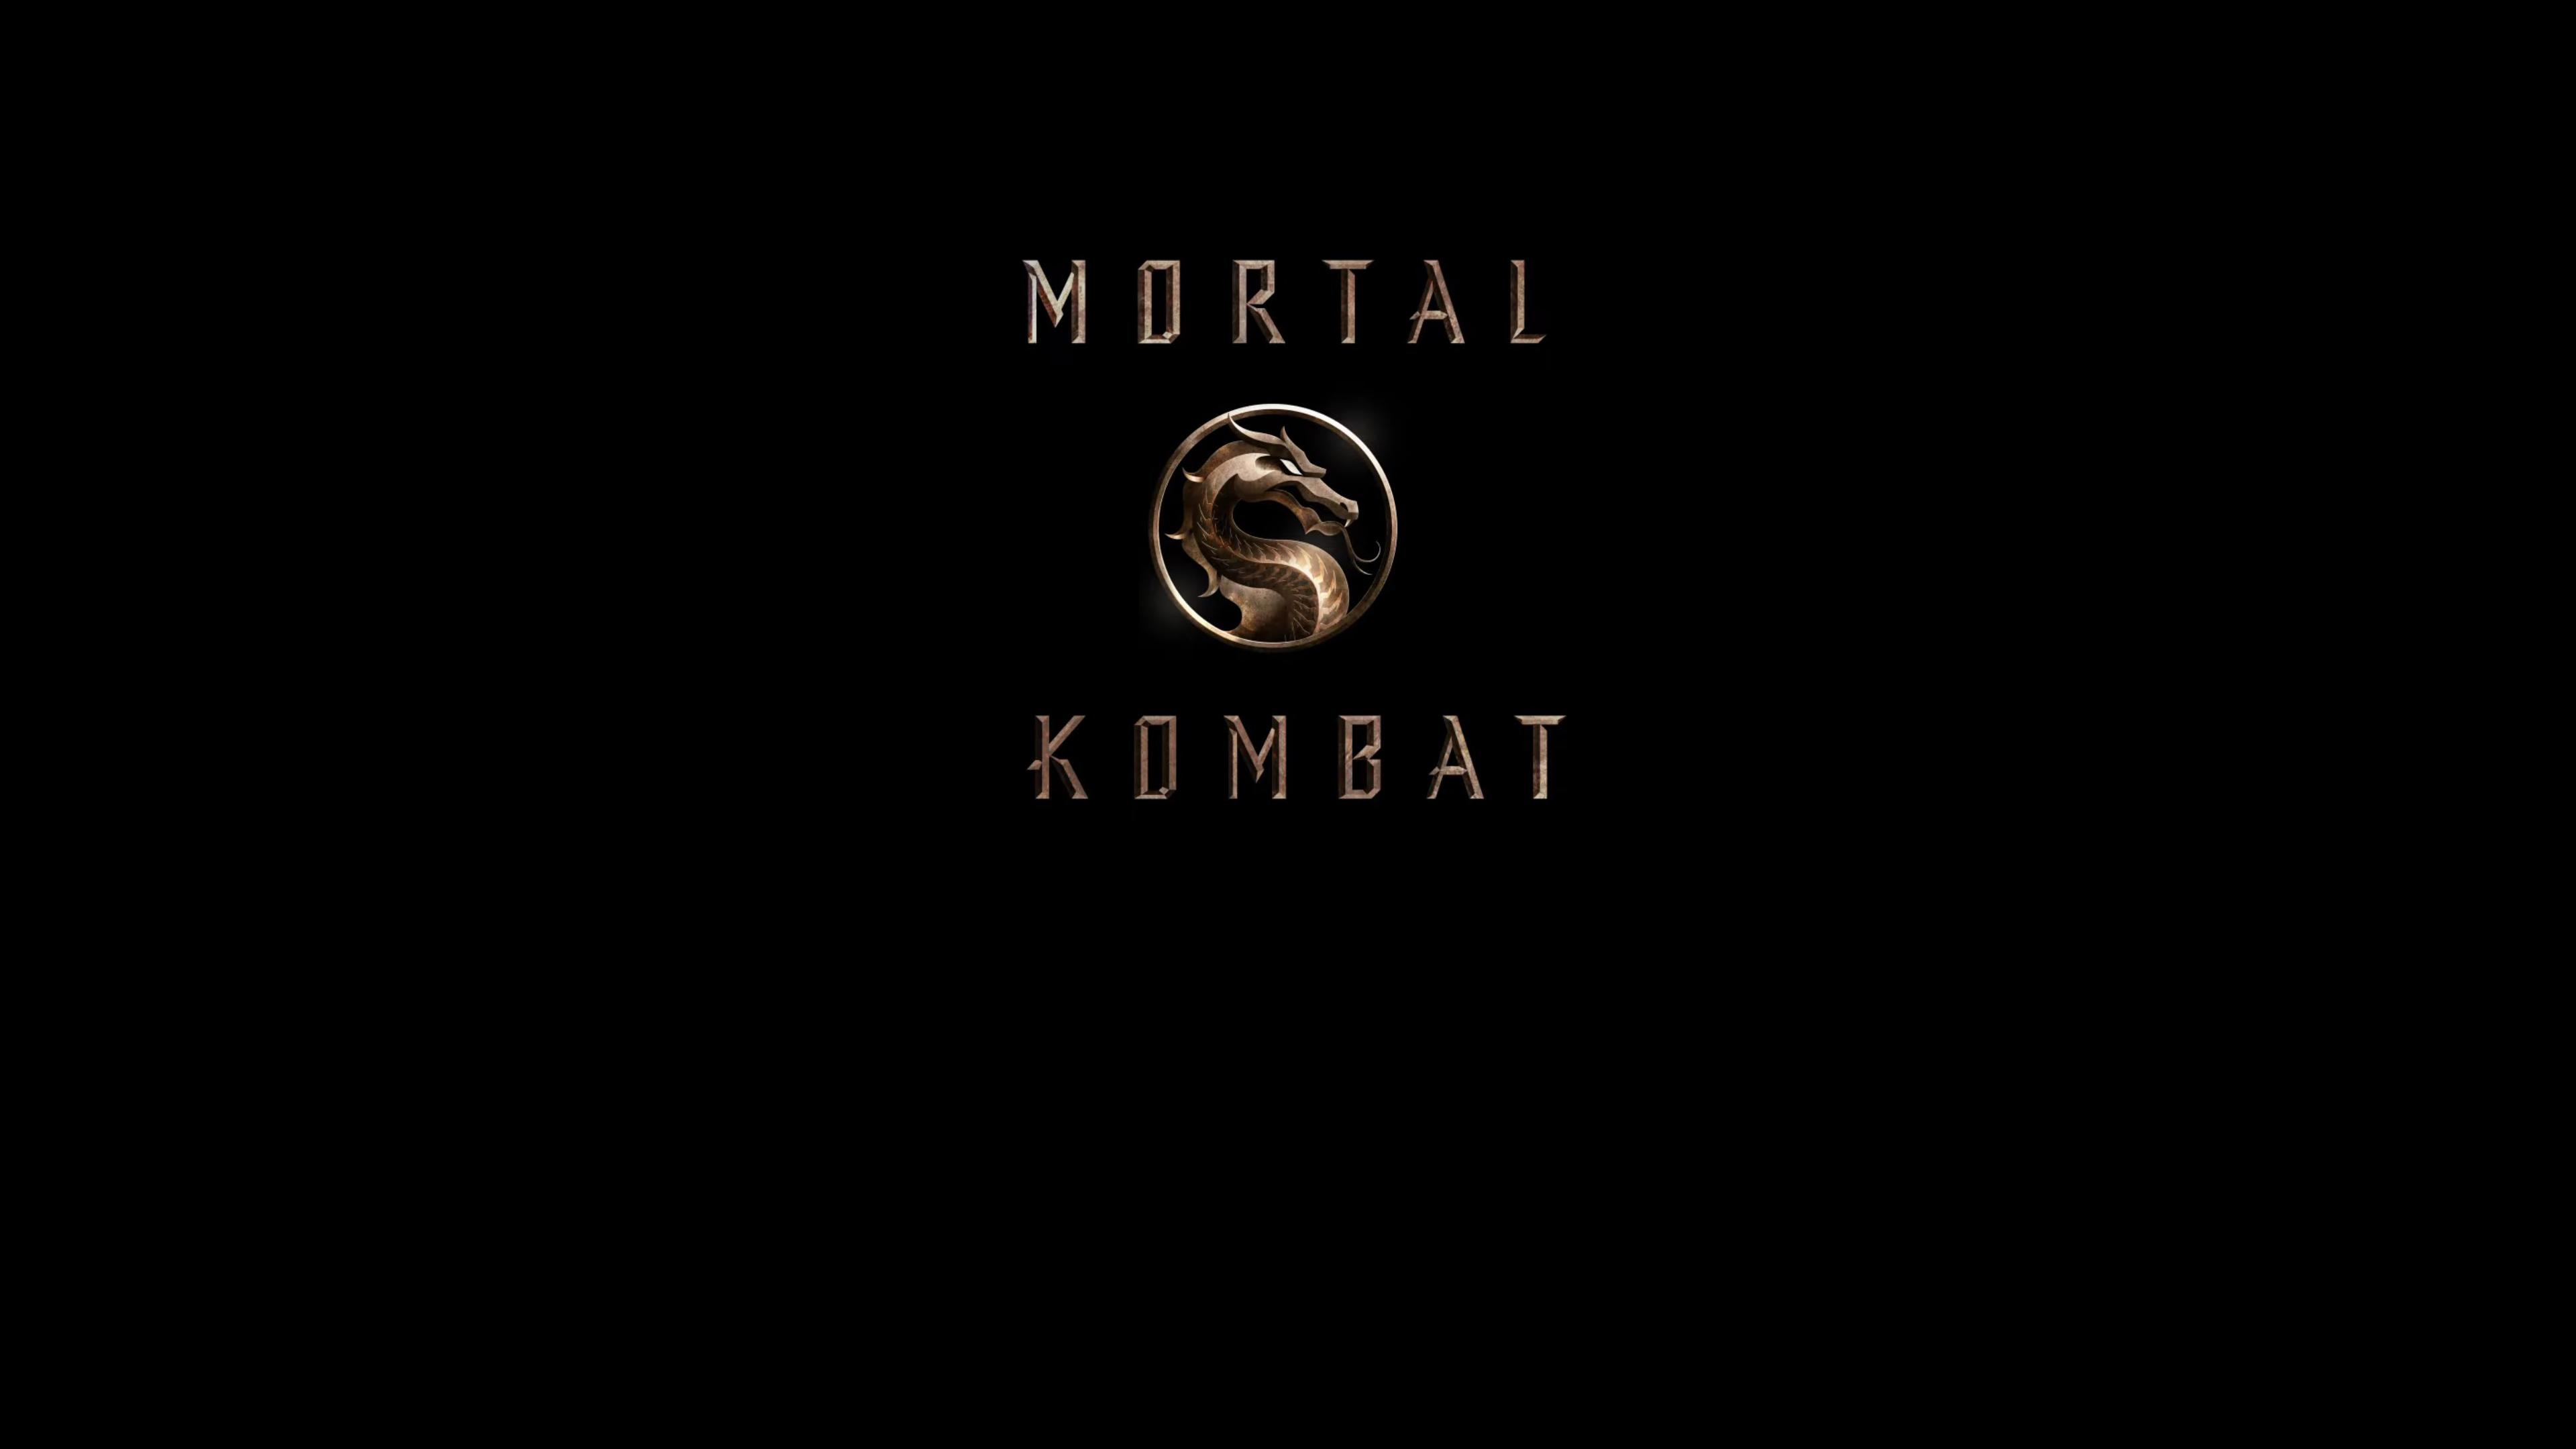 mortal kombat 2021 movie logo 4k 1611597623 - Mortal Kombat 2021 Movie Logo 4k - Mortal Kombat 2021 Movie Logo 4k wallpapers